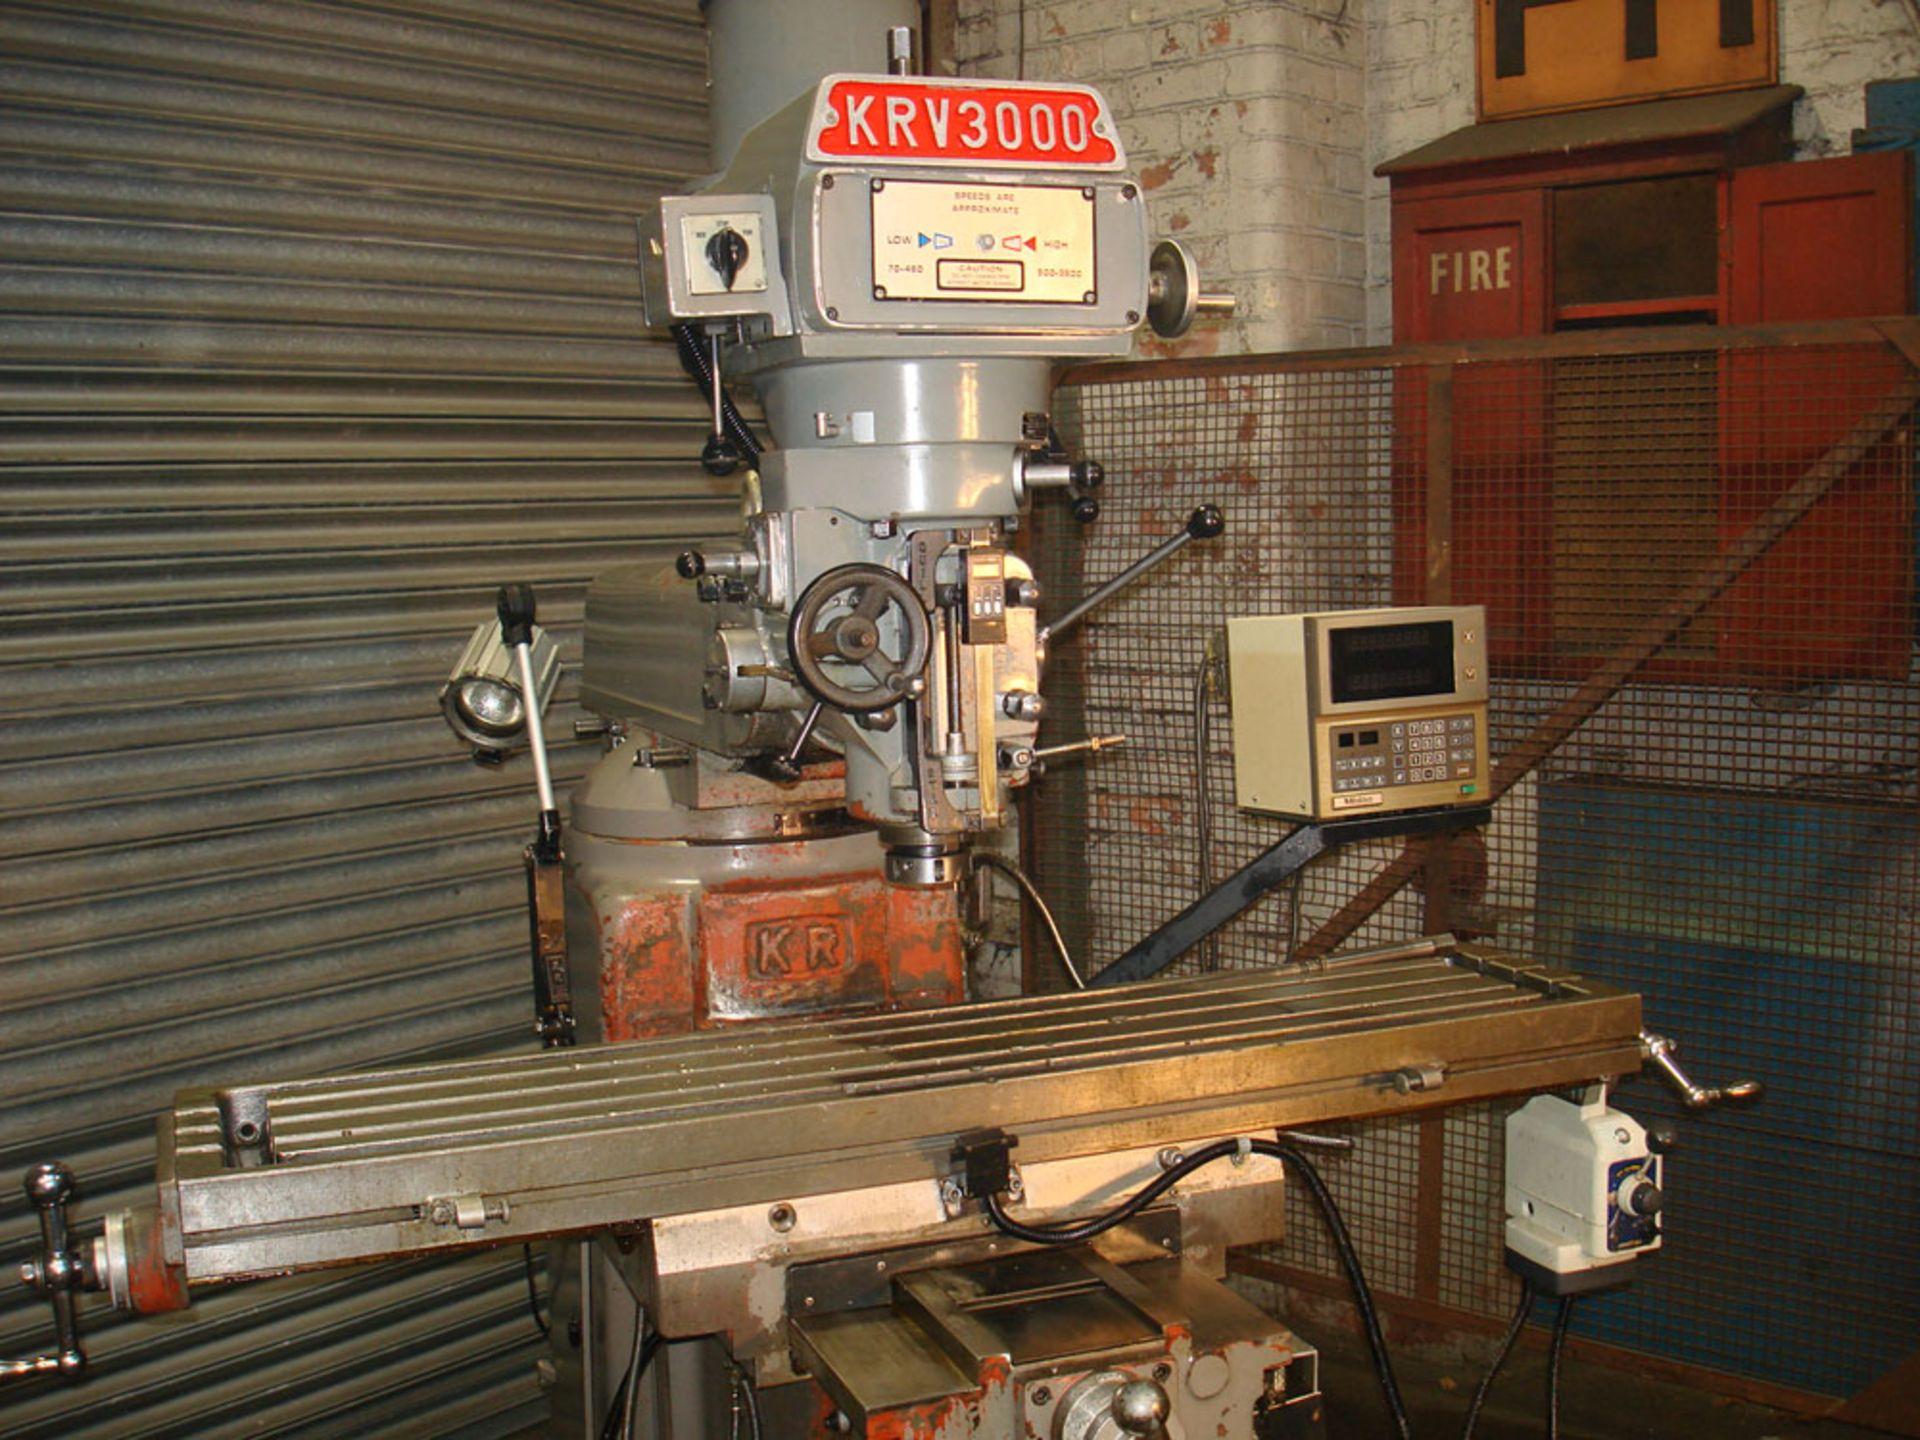 KRV 3000 SLV Turret Milling Machine. Table Size 1473 x 305mm. - Image 2 of 7